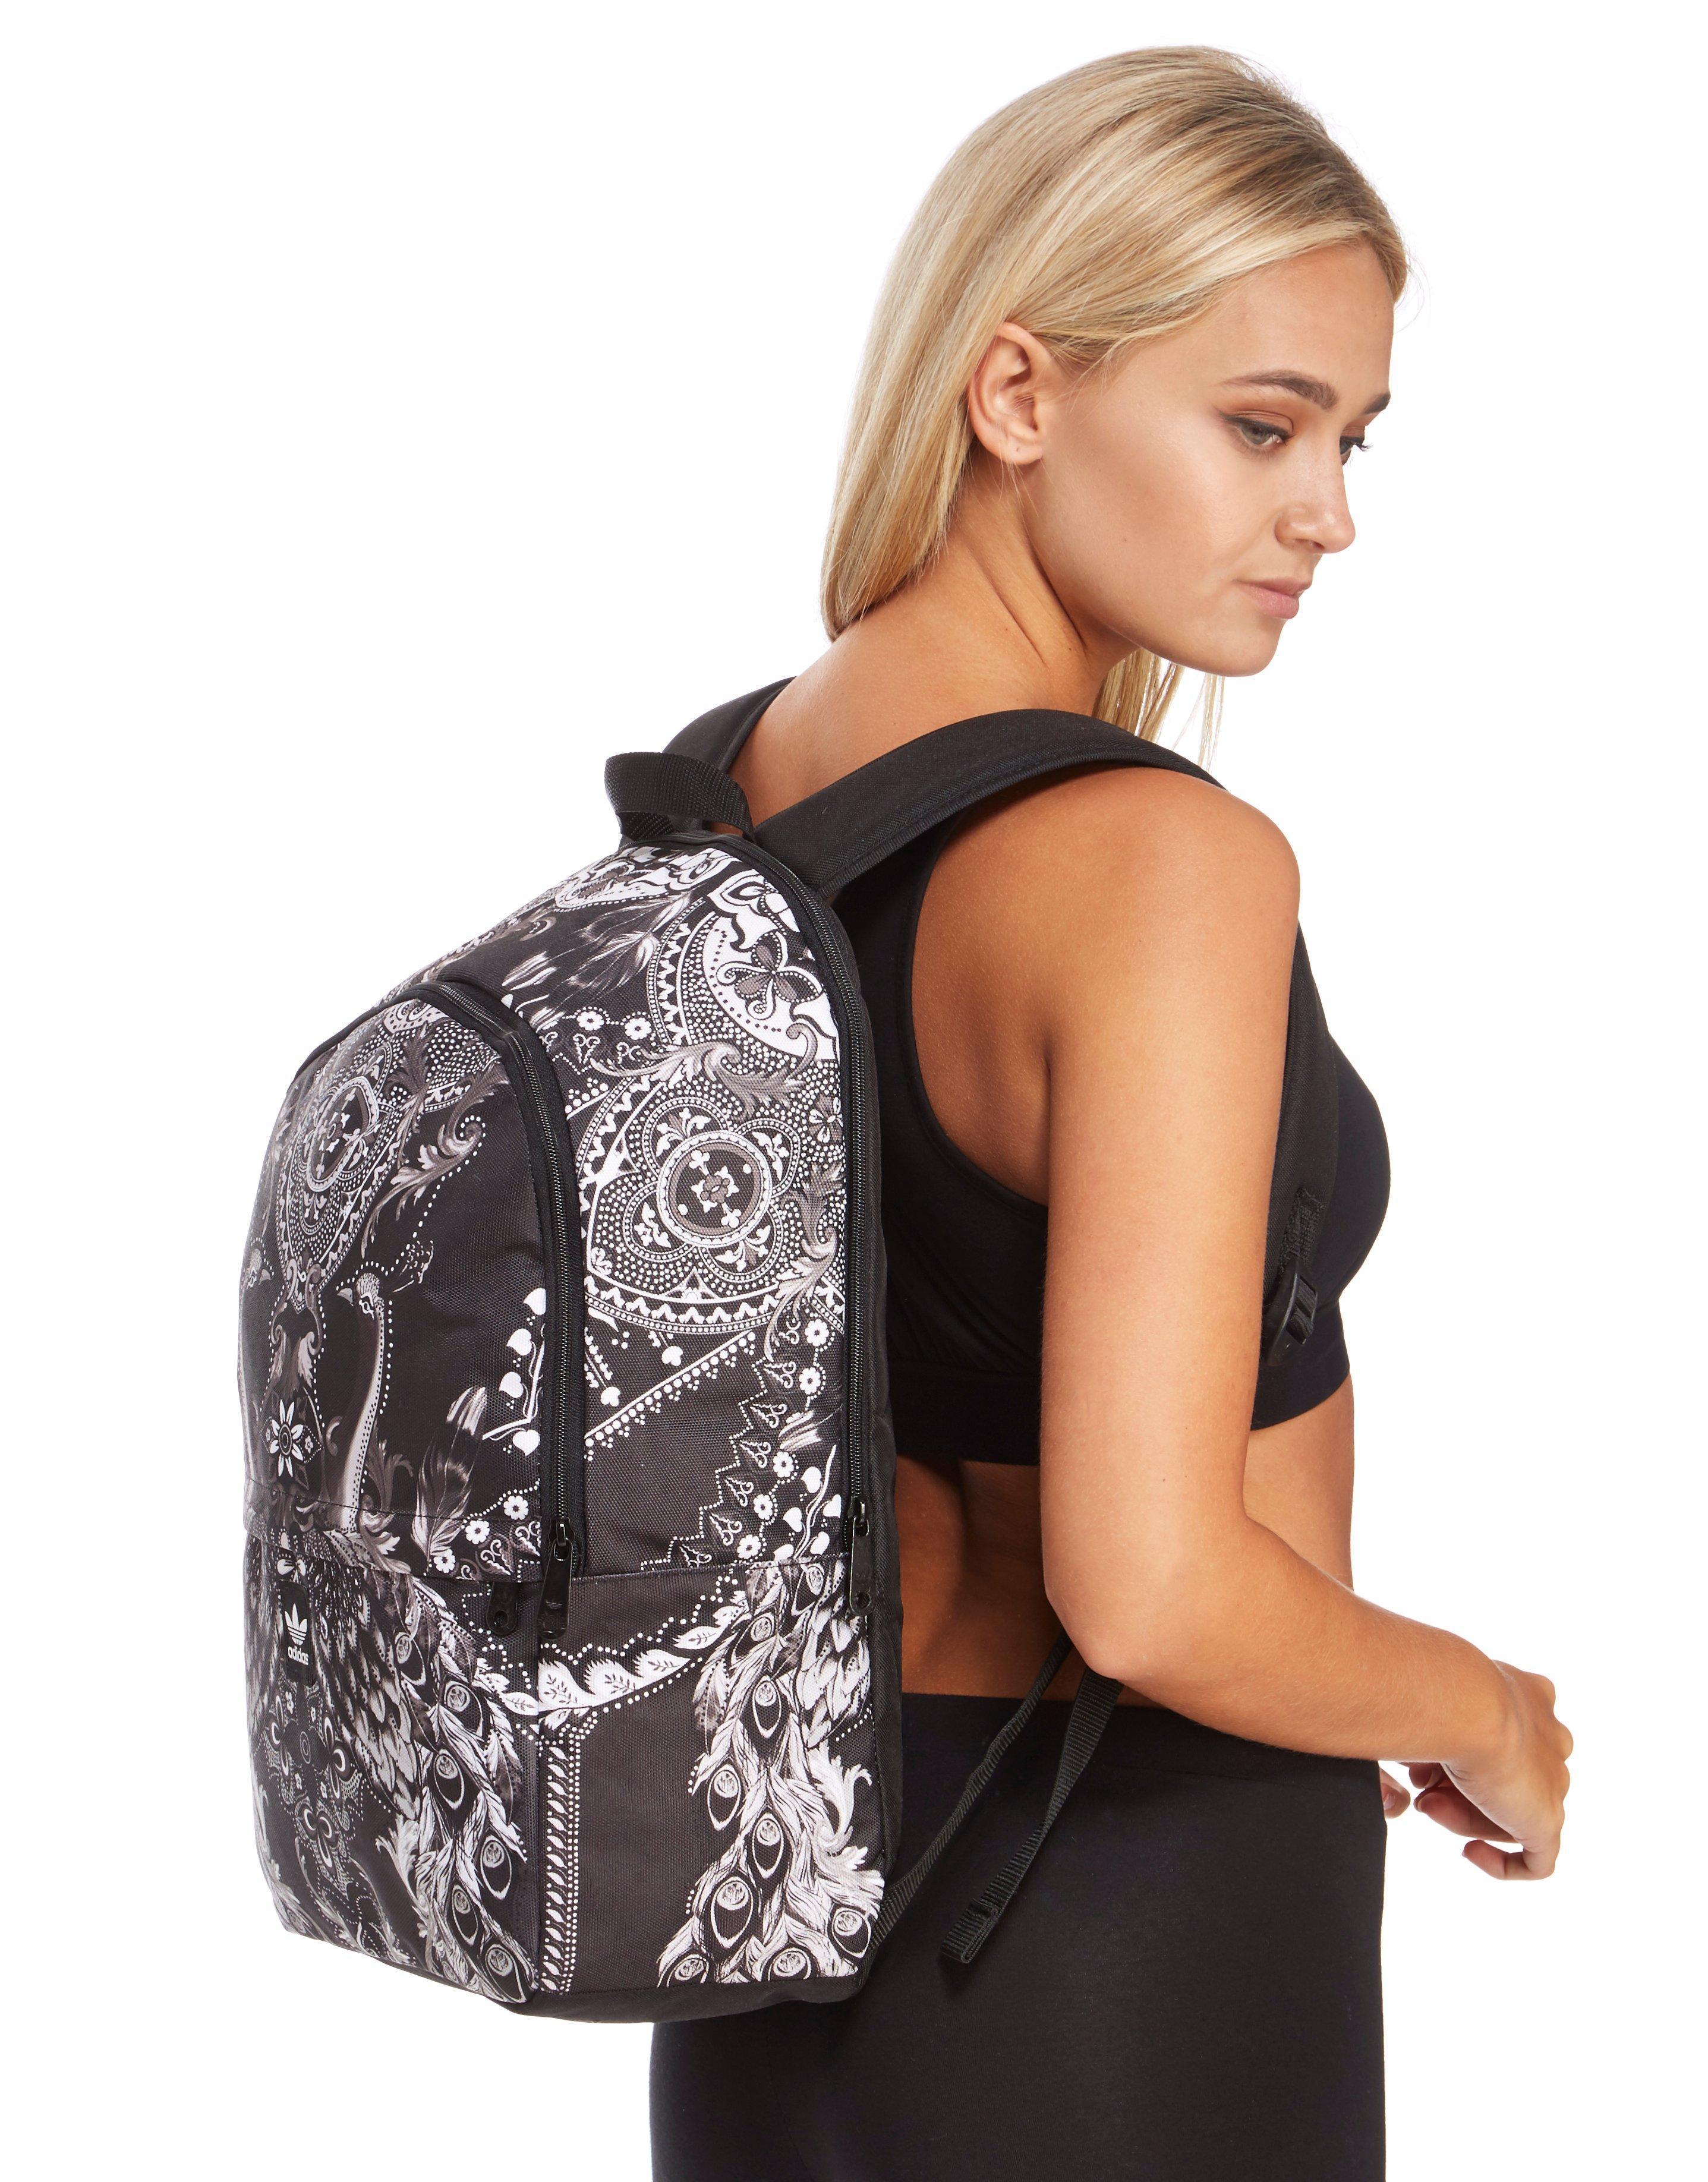 facf5e85b5 adidas Originals Essentials Pavao Backpack in Black - Lyst